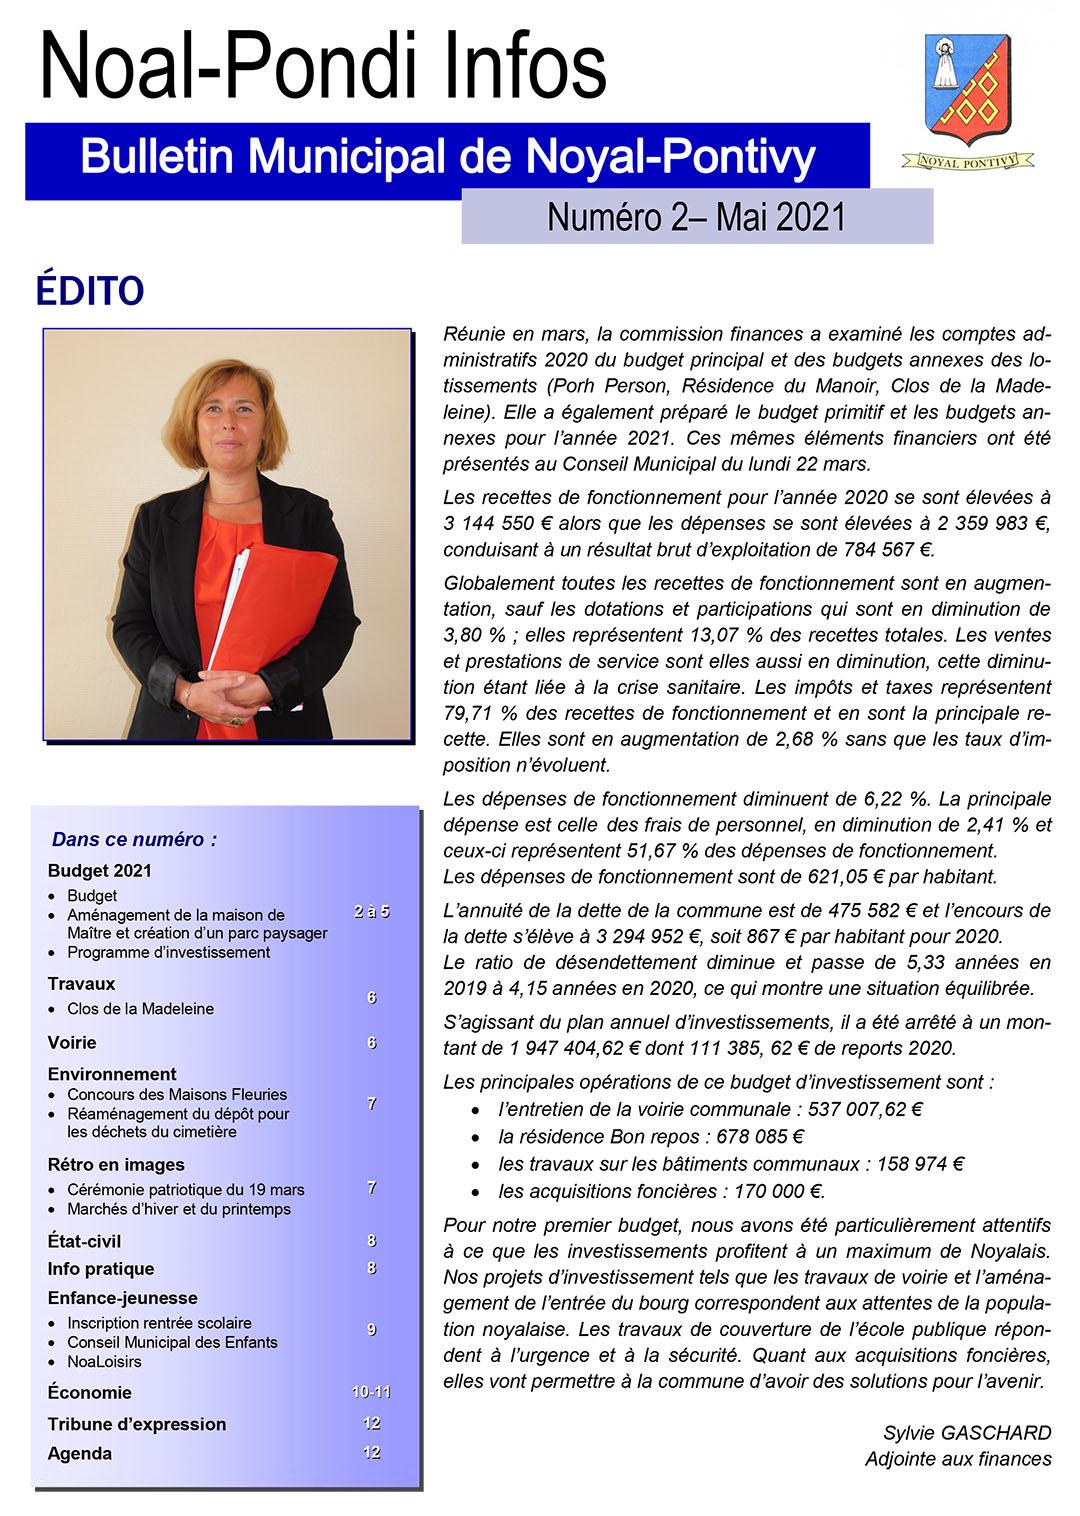 Bulletin Municipal de la Mairie de Noyal Pontivy - Mai 2021